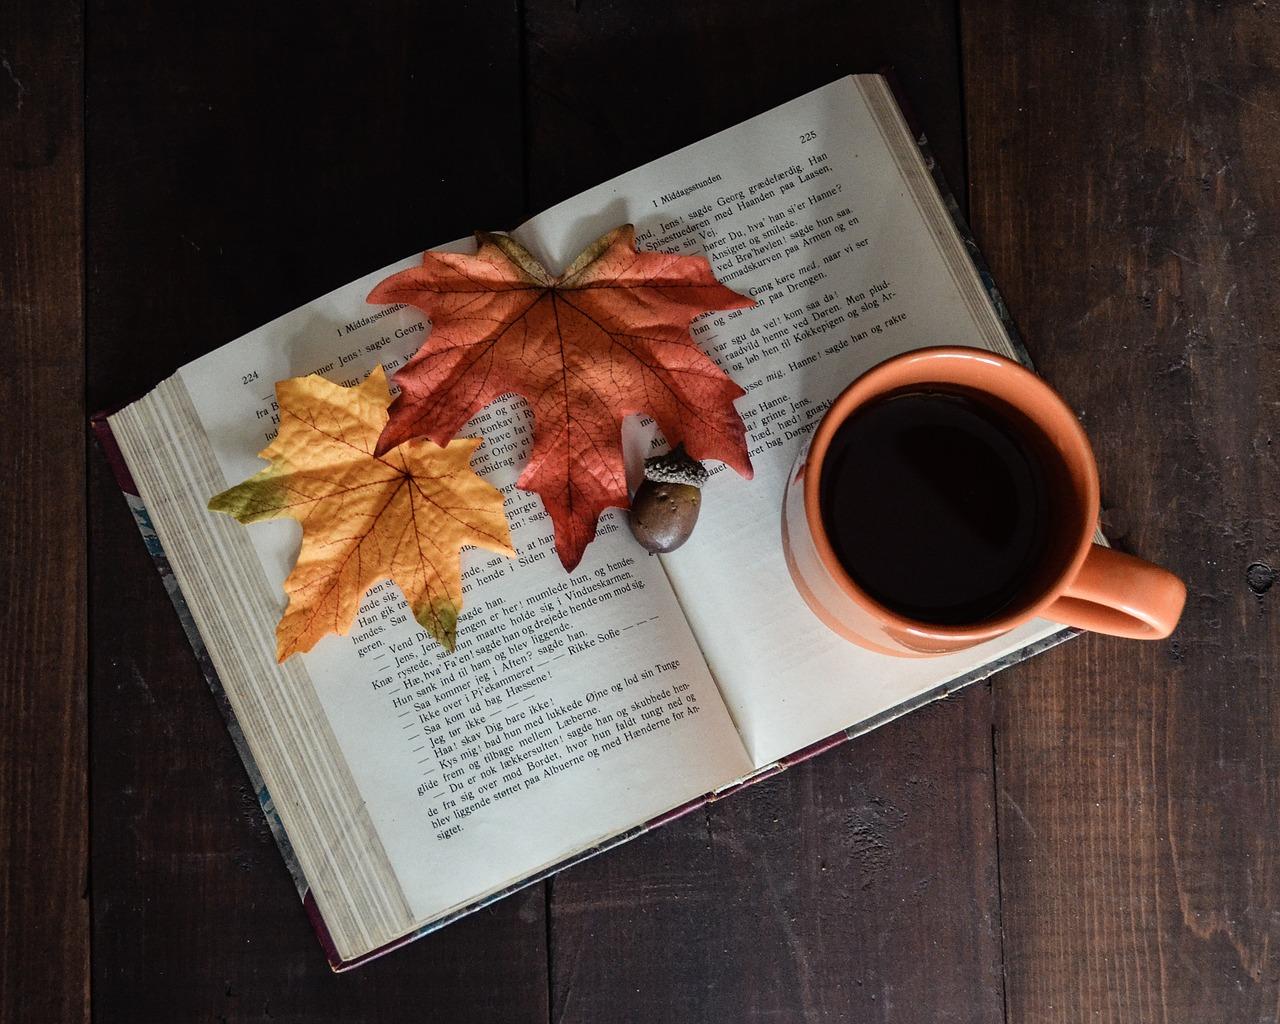 Družite se sa knjigom i u jesen: Kad zahladni, neka vas greje dobar roman